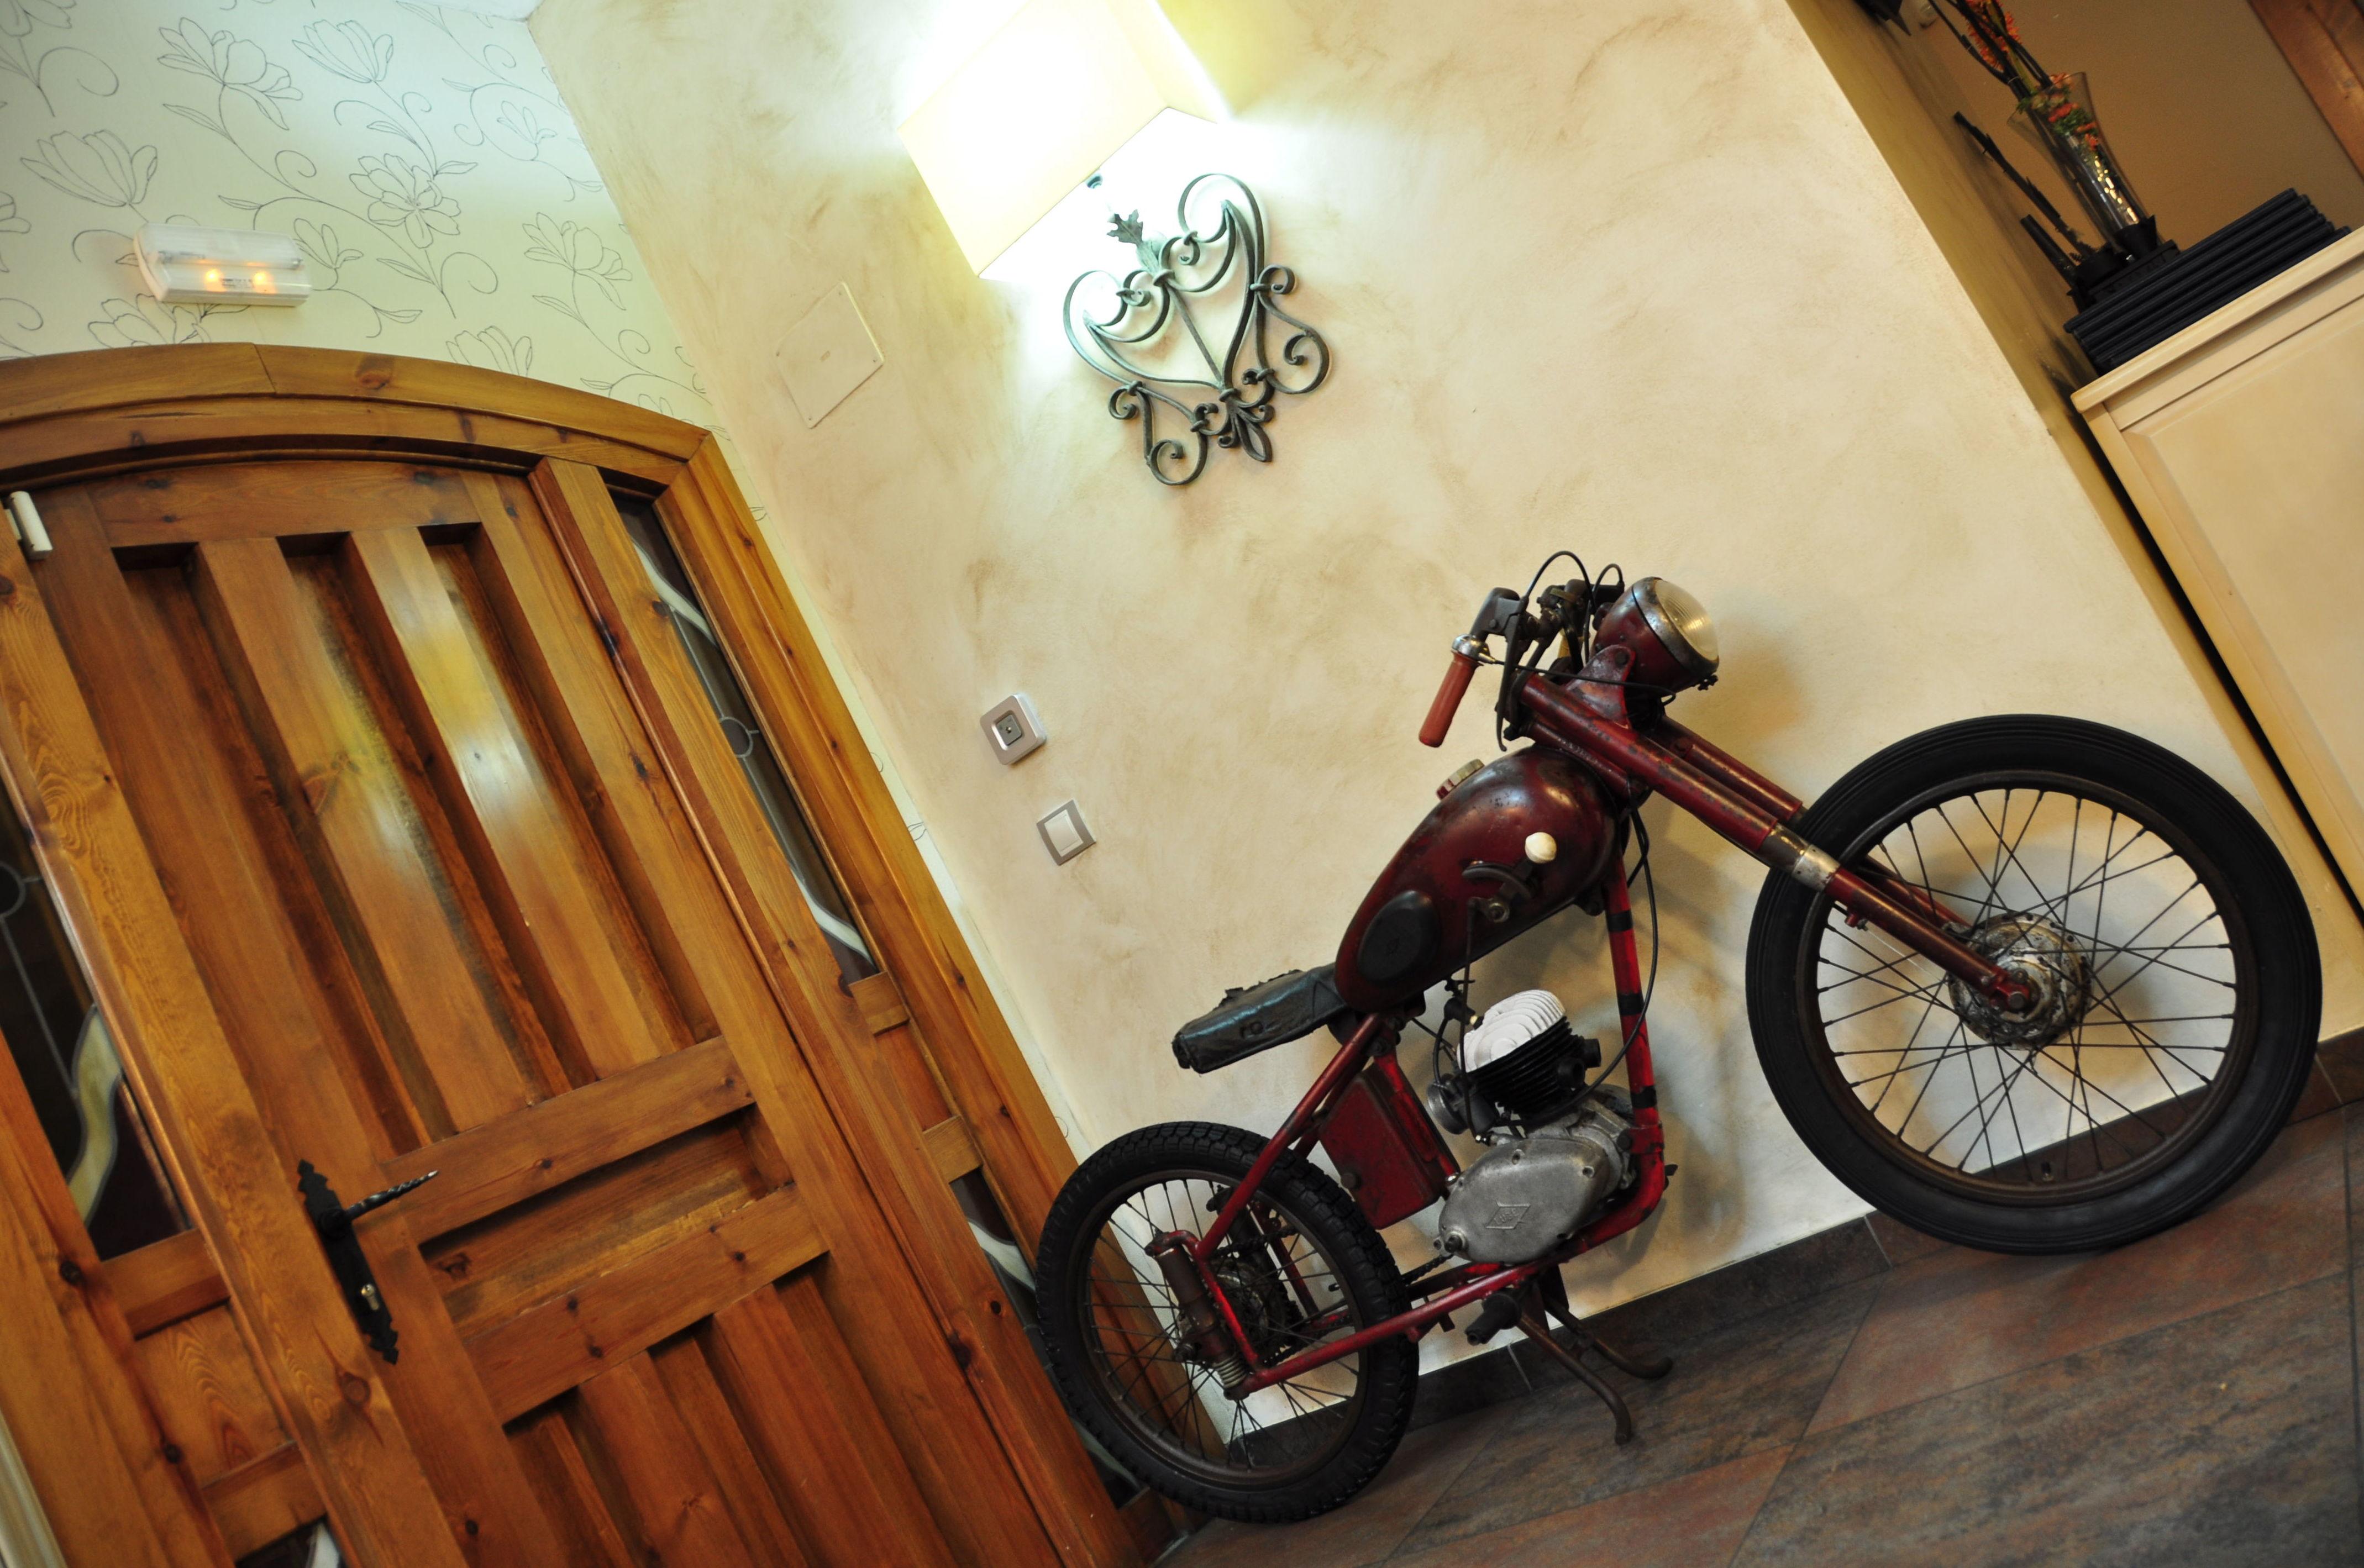 Detalle atrezzo restaurante motocicleta Lube de carreras años 50